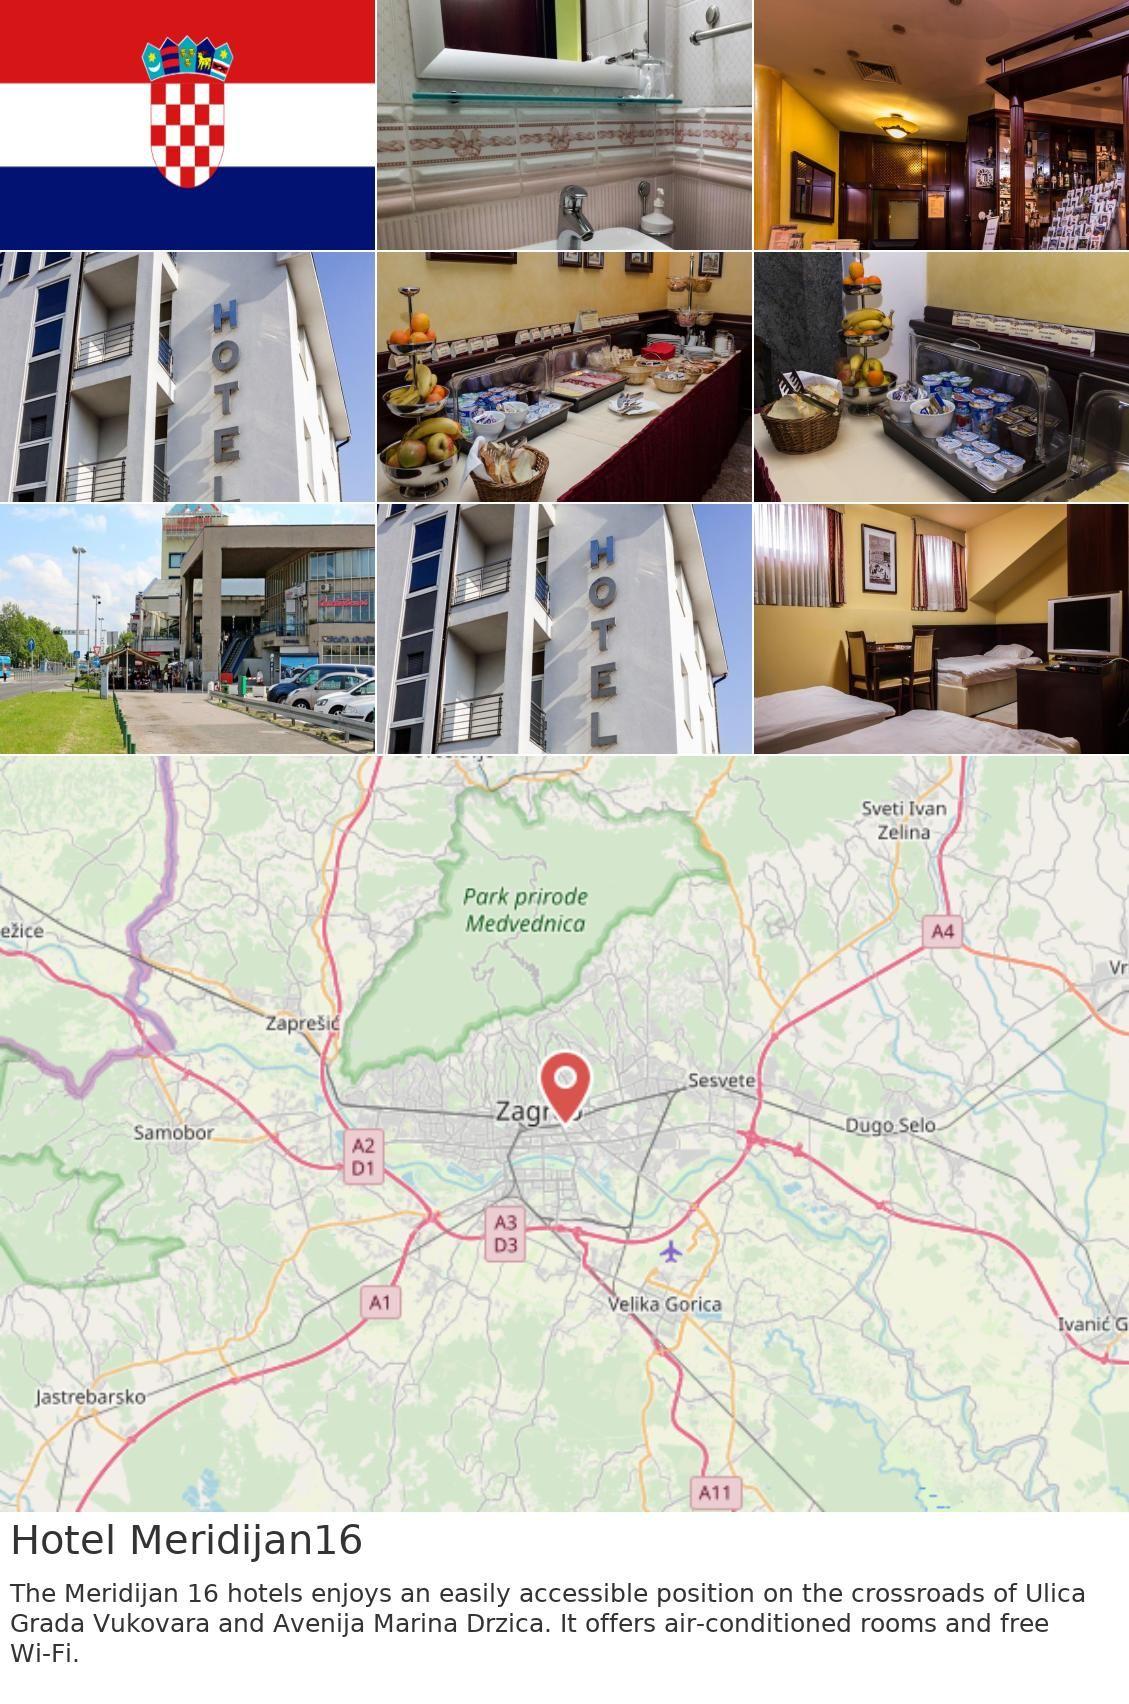 Europe Croatia Zagreb Hotel Meridijan16 The Meridijan 16 Hotels Enjoys An Easily Accessible Position On The Crossroads Of Ulica Grada Vukovara And Avenija M